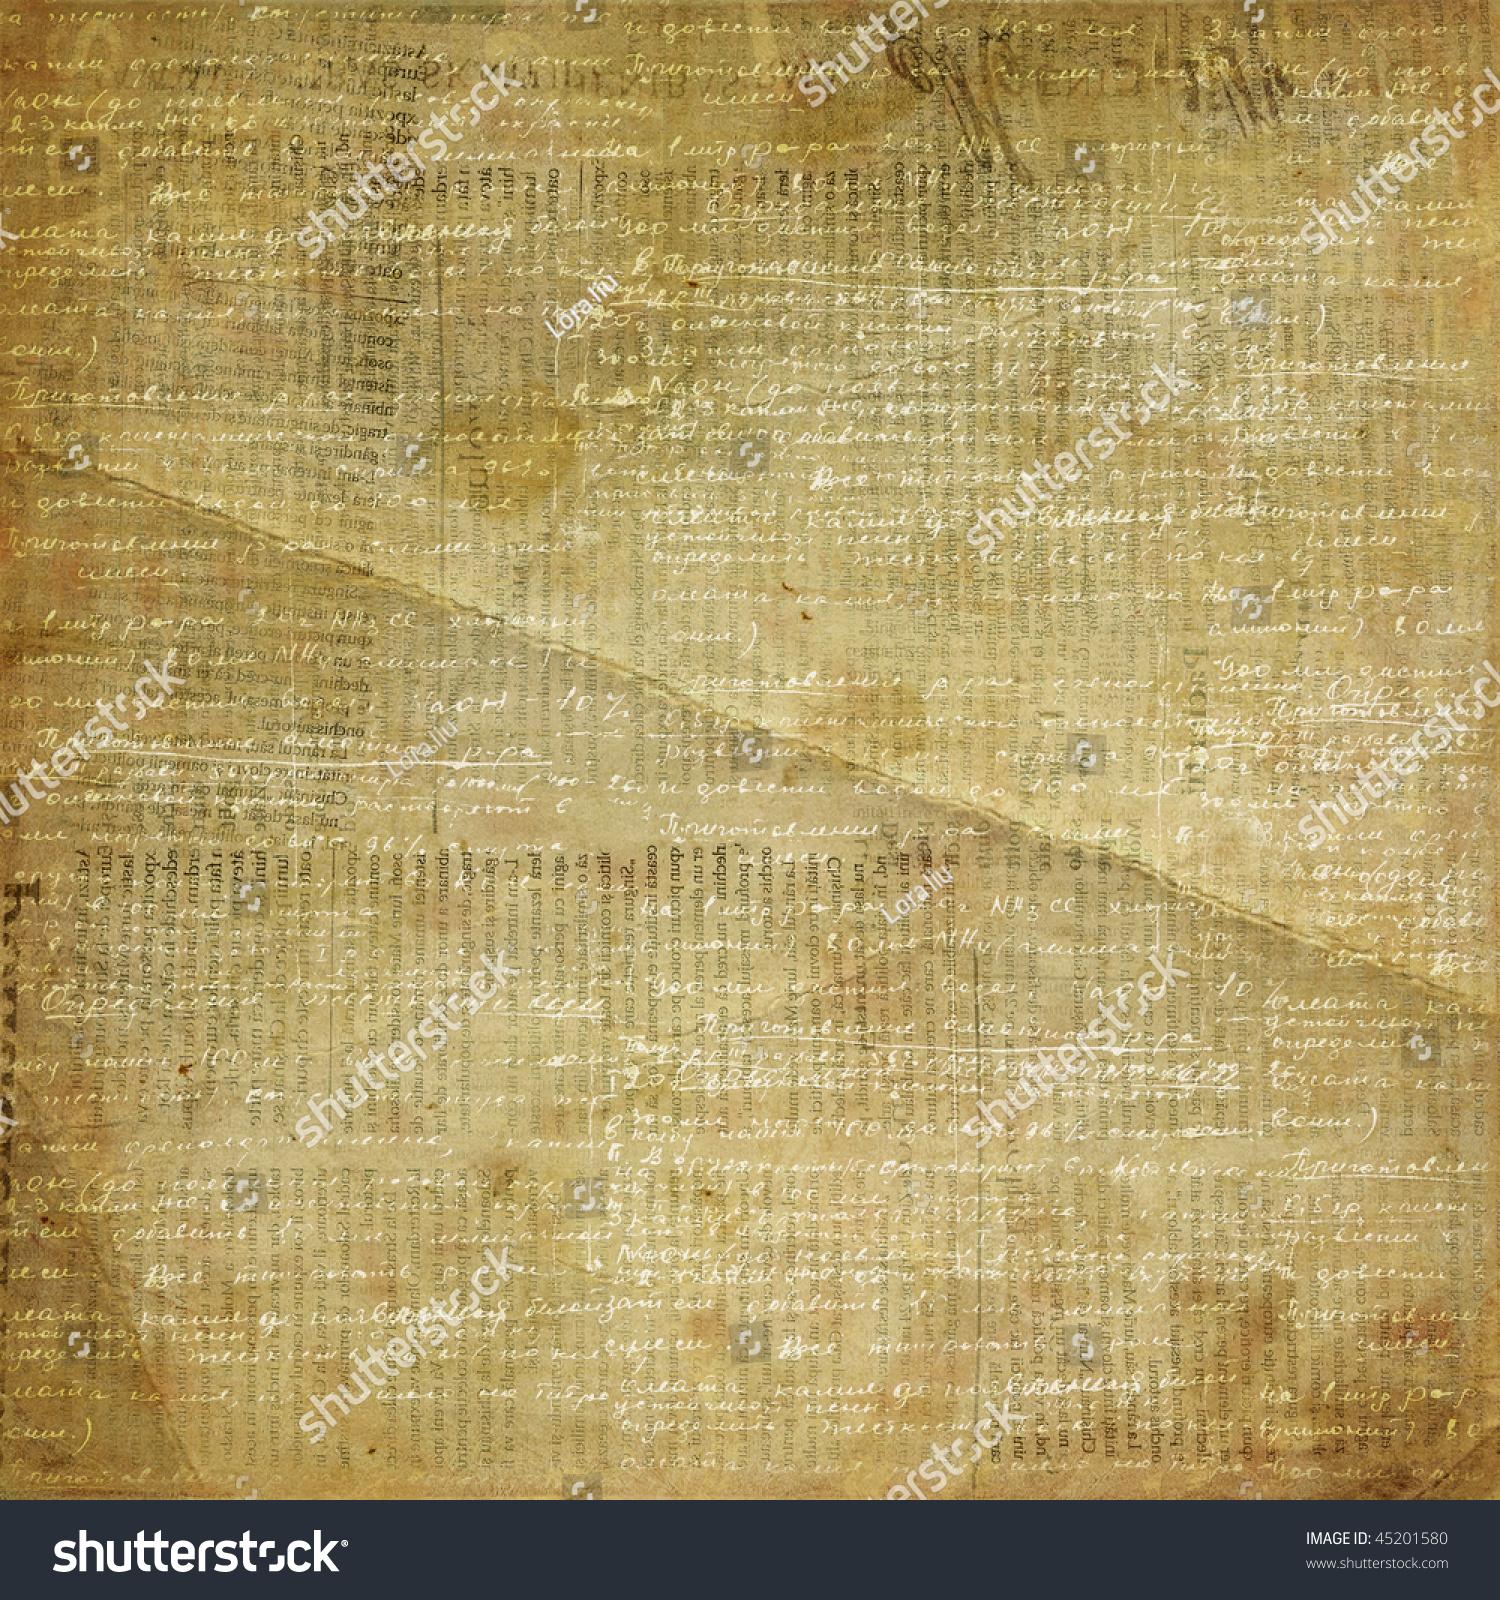 Vintage Newspaper Abstract Background Printed Text – Vintage Newspaper